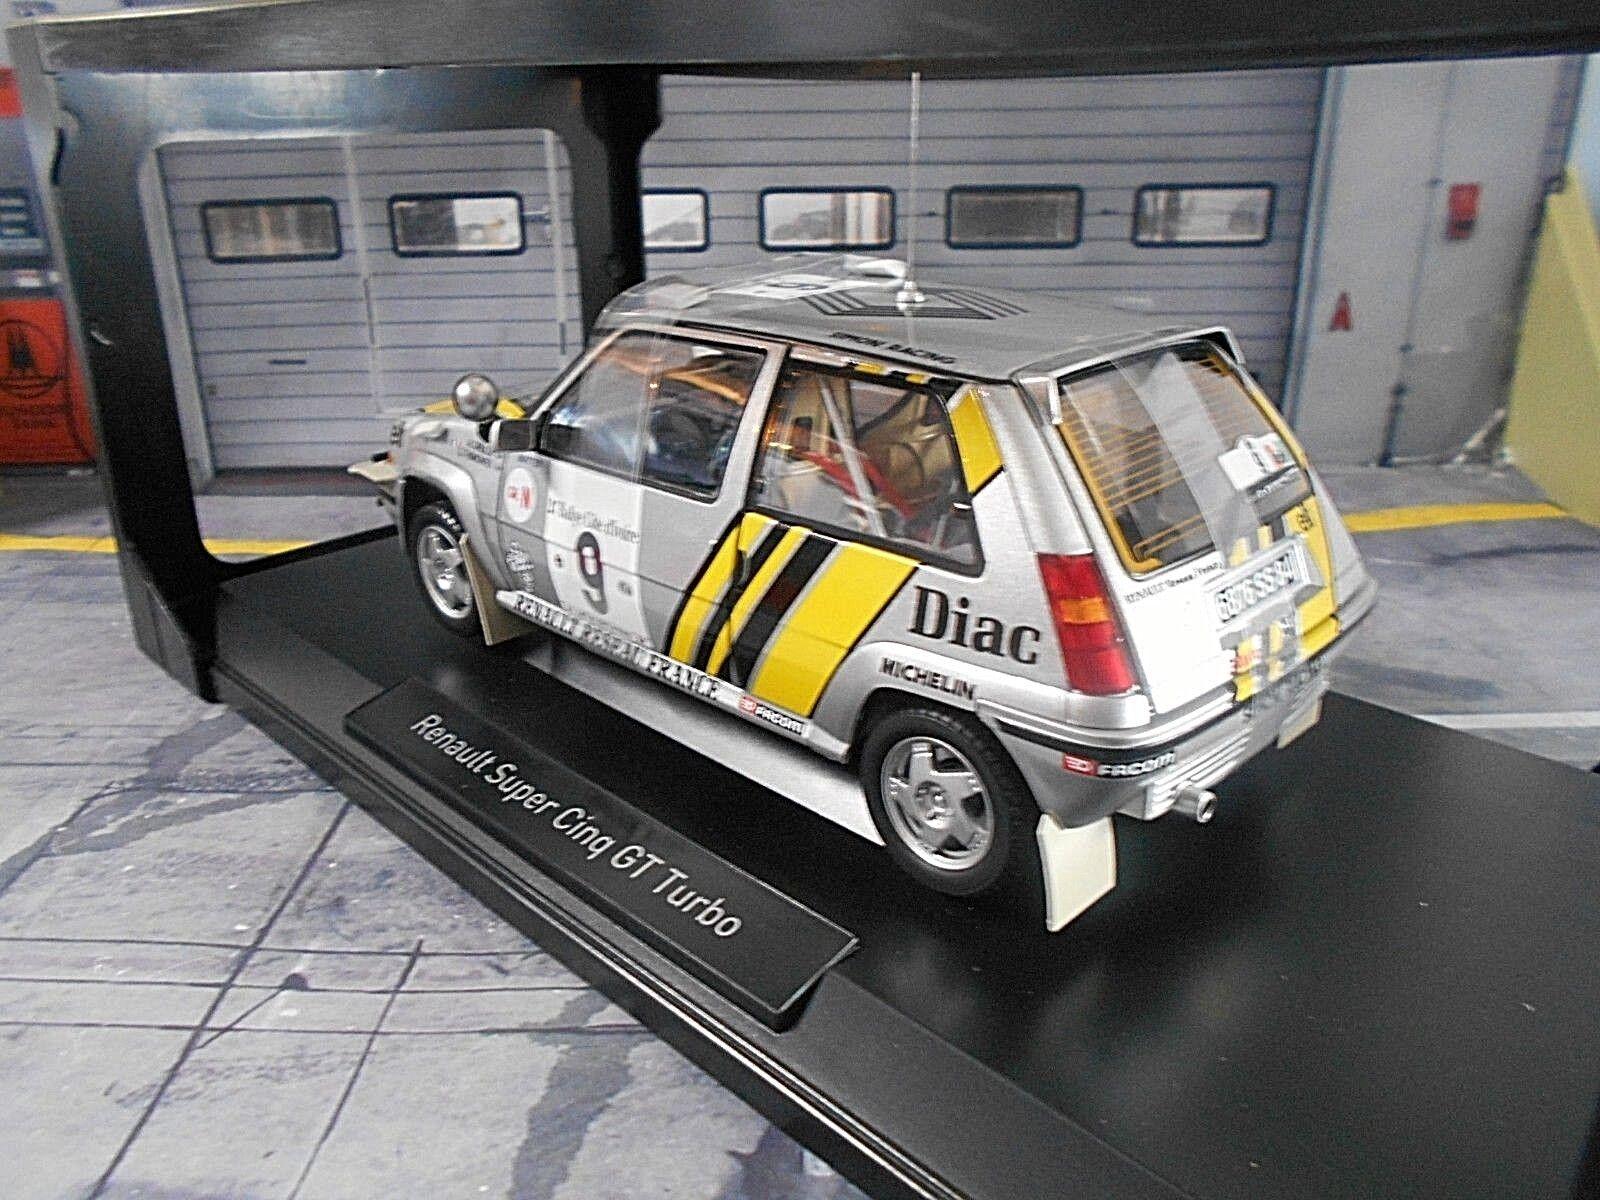 RENAULT 5 5 5 Turbo GT Rallye Bandama Ivoire 1989 Oreille Diac elf Norev 1 18 d62c27